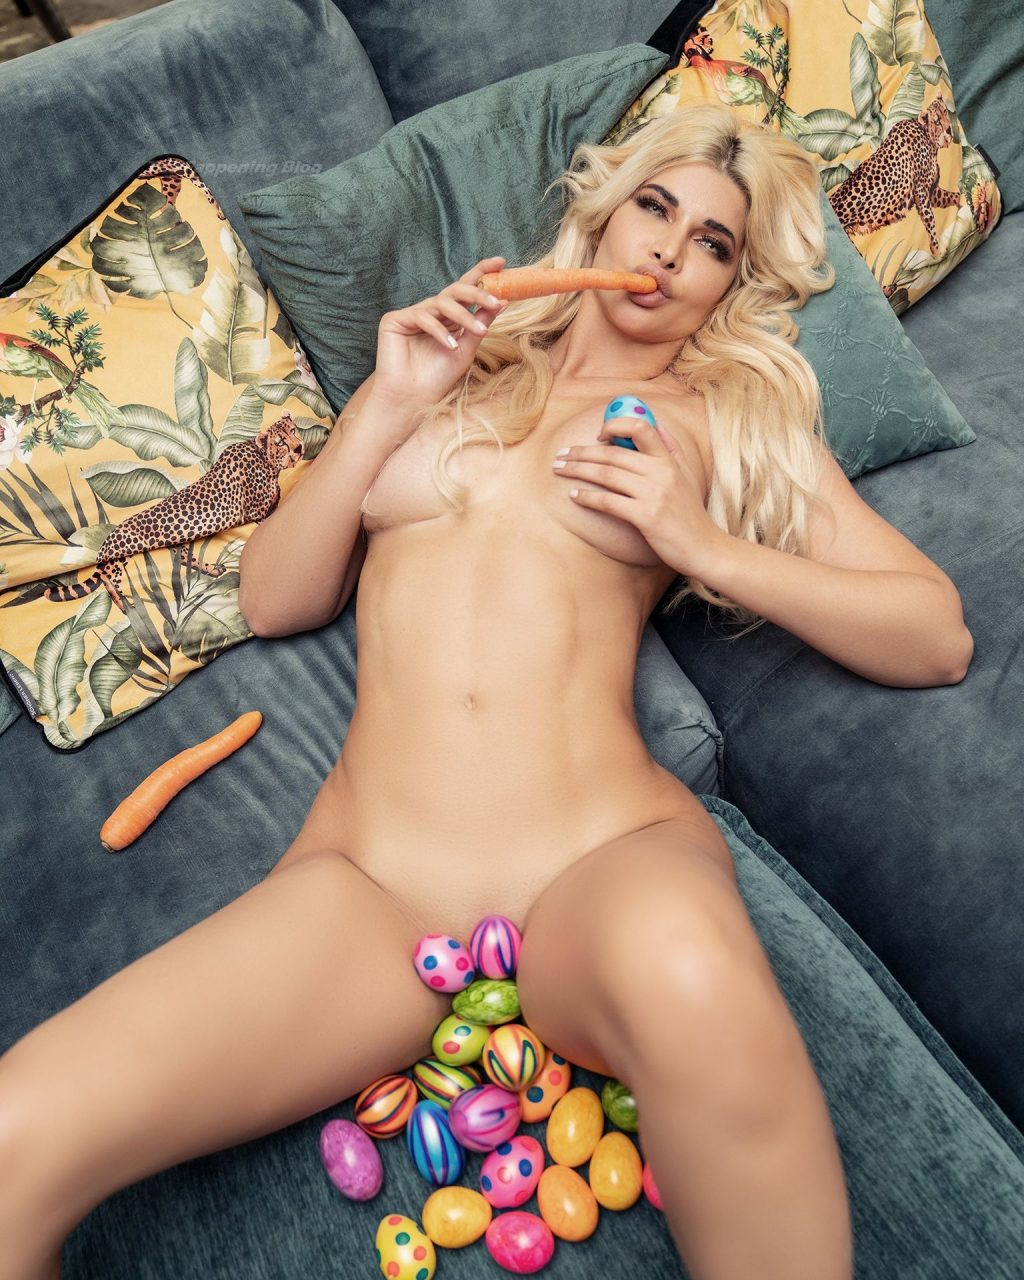 Micaela Schäfer Nude (3 New Photos)